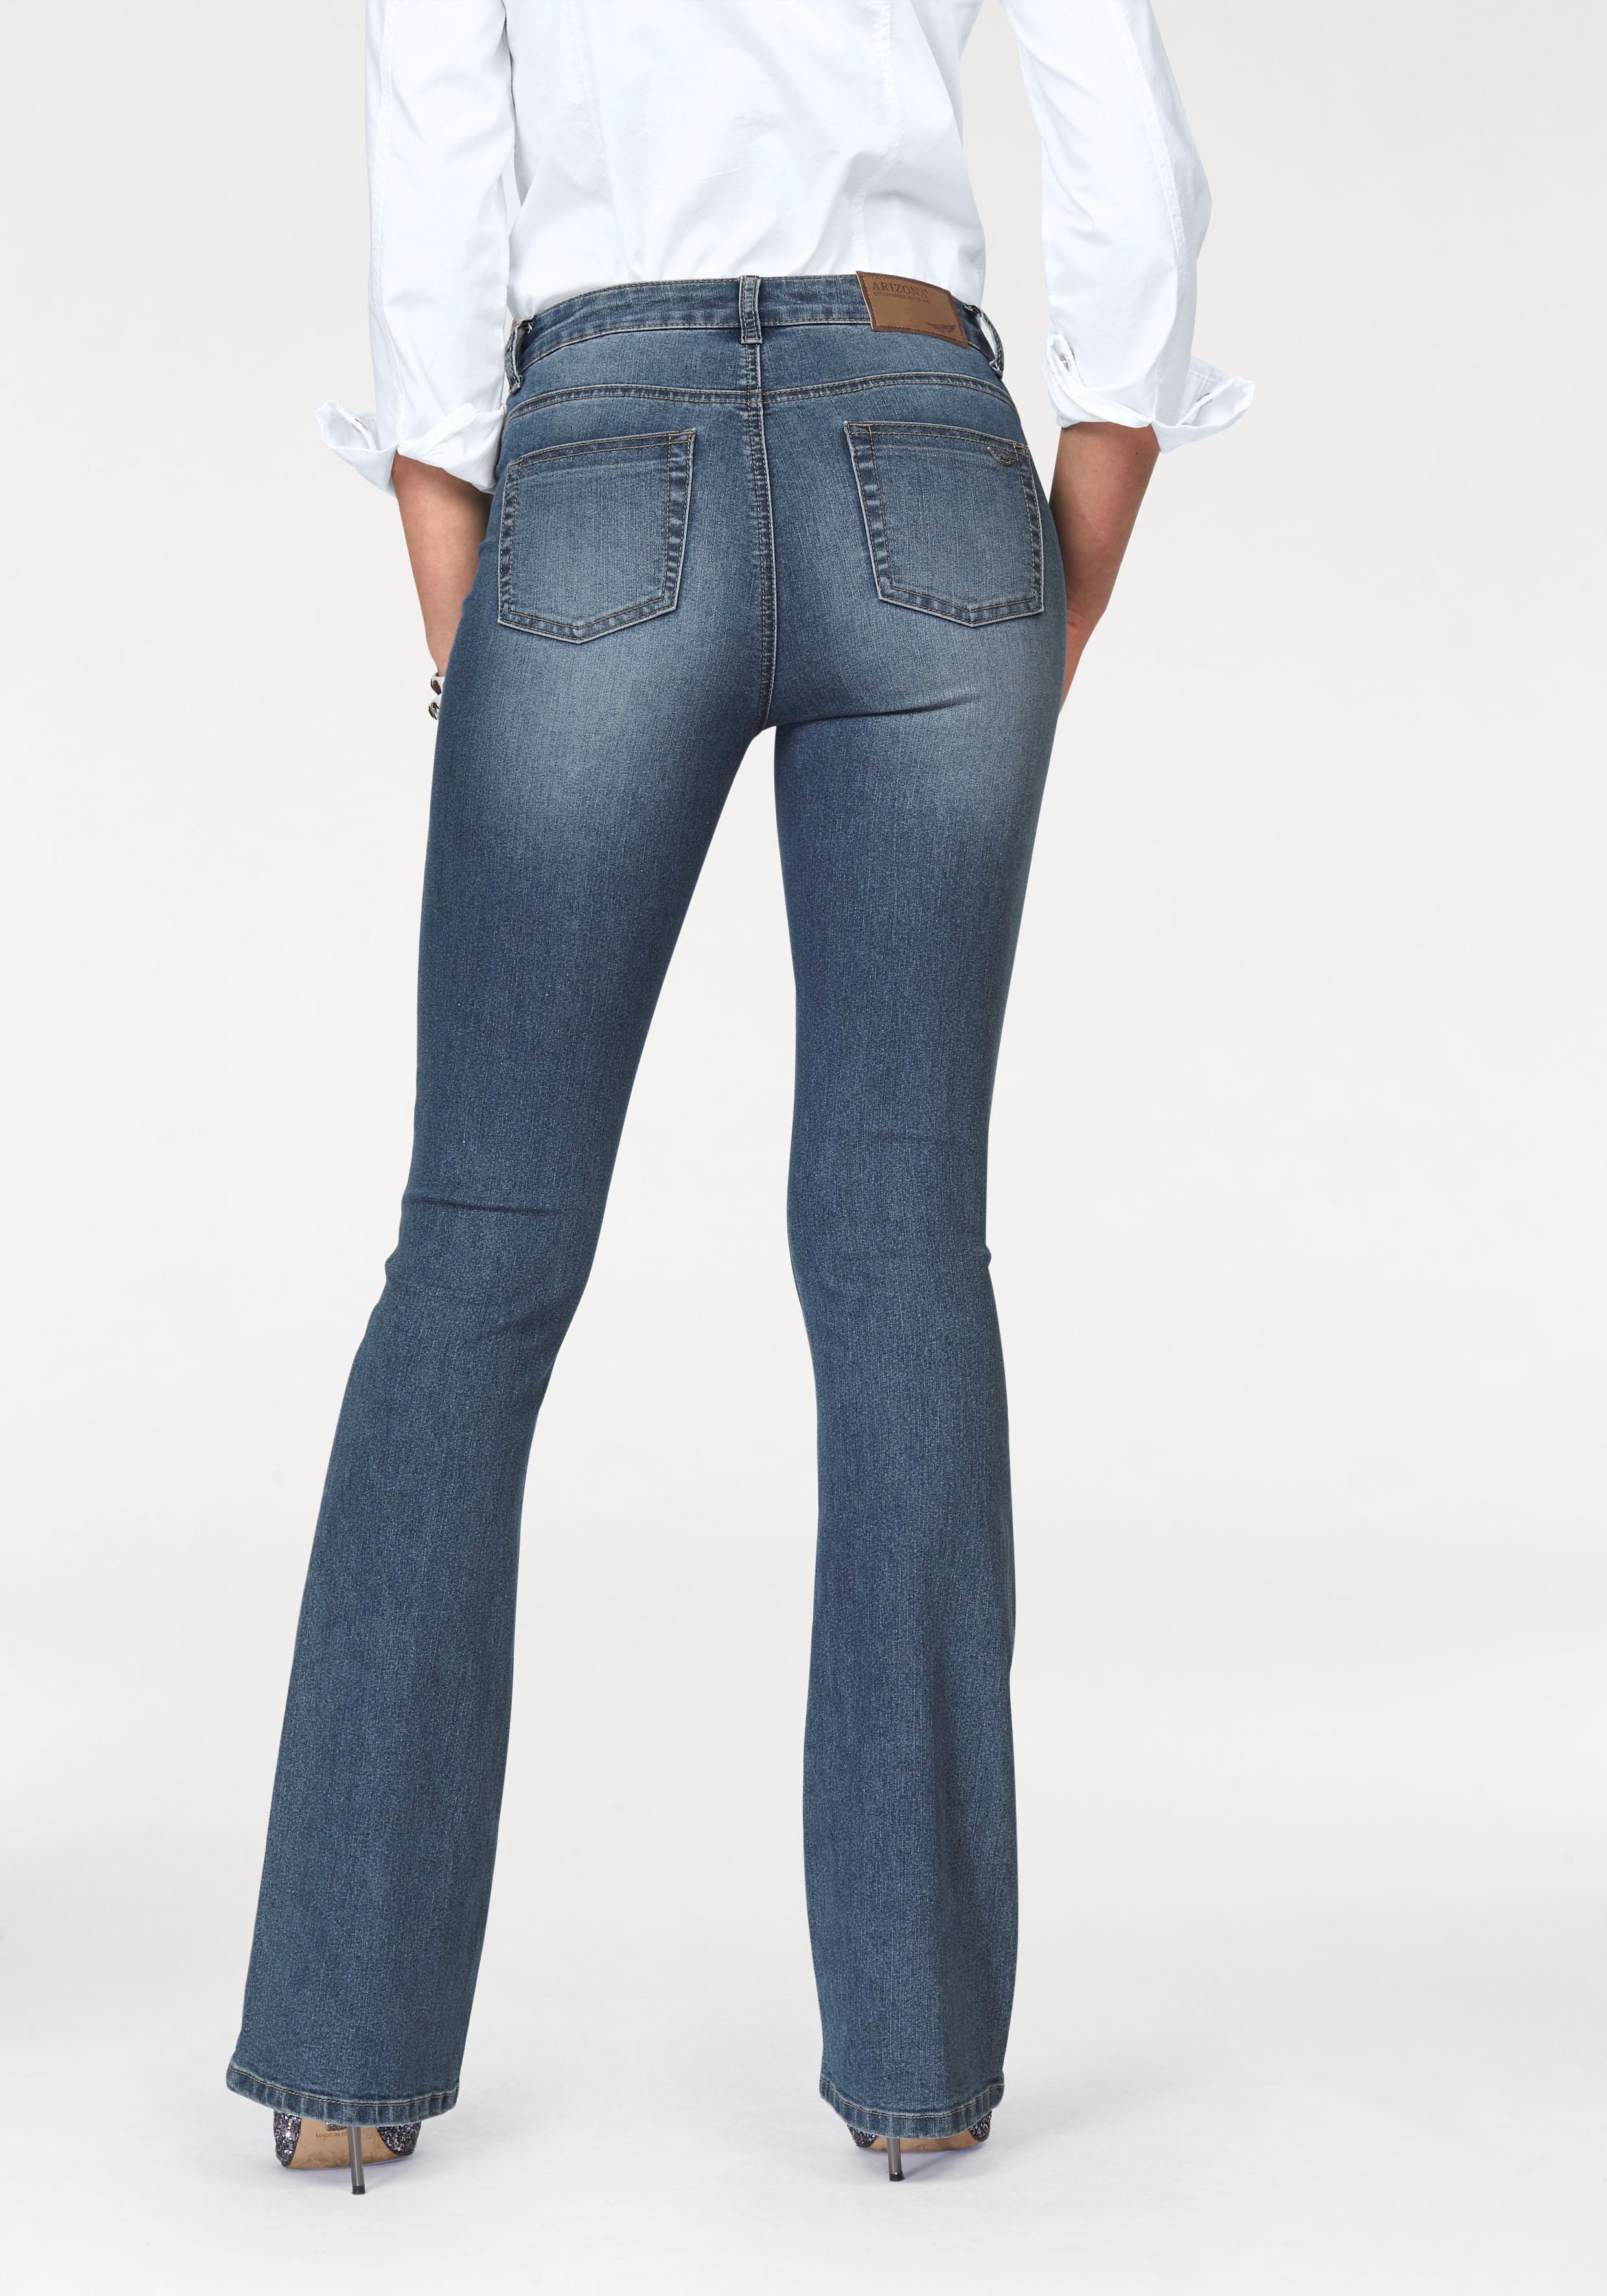 Arizona Bootcut Jeans »Shaping« High Waist kaufen   OTTO